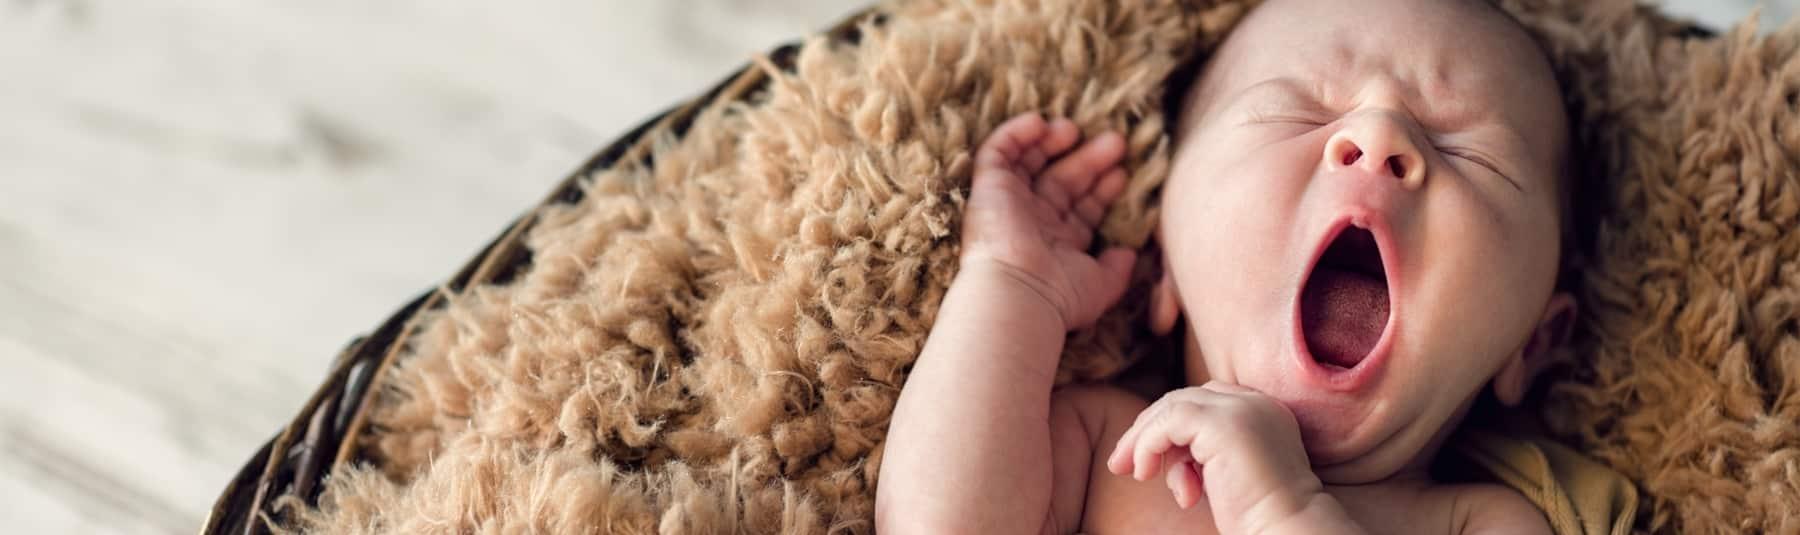 ukraine surrogacy cost